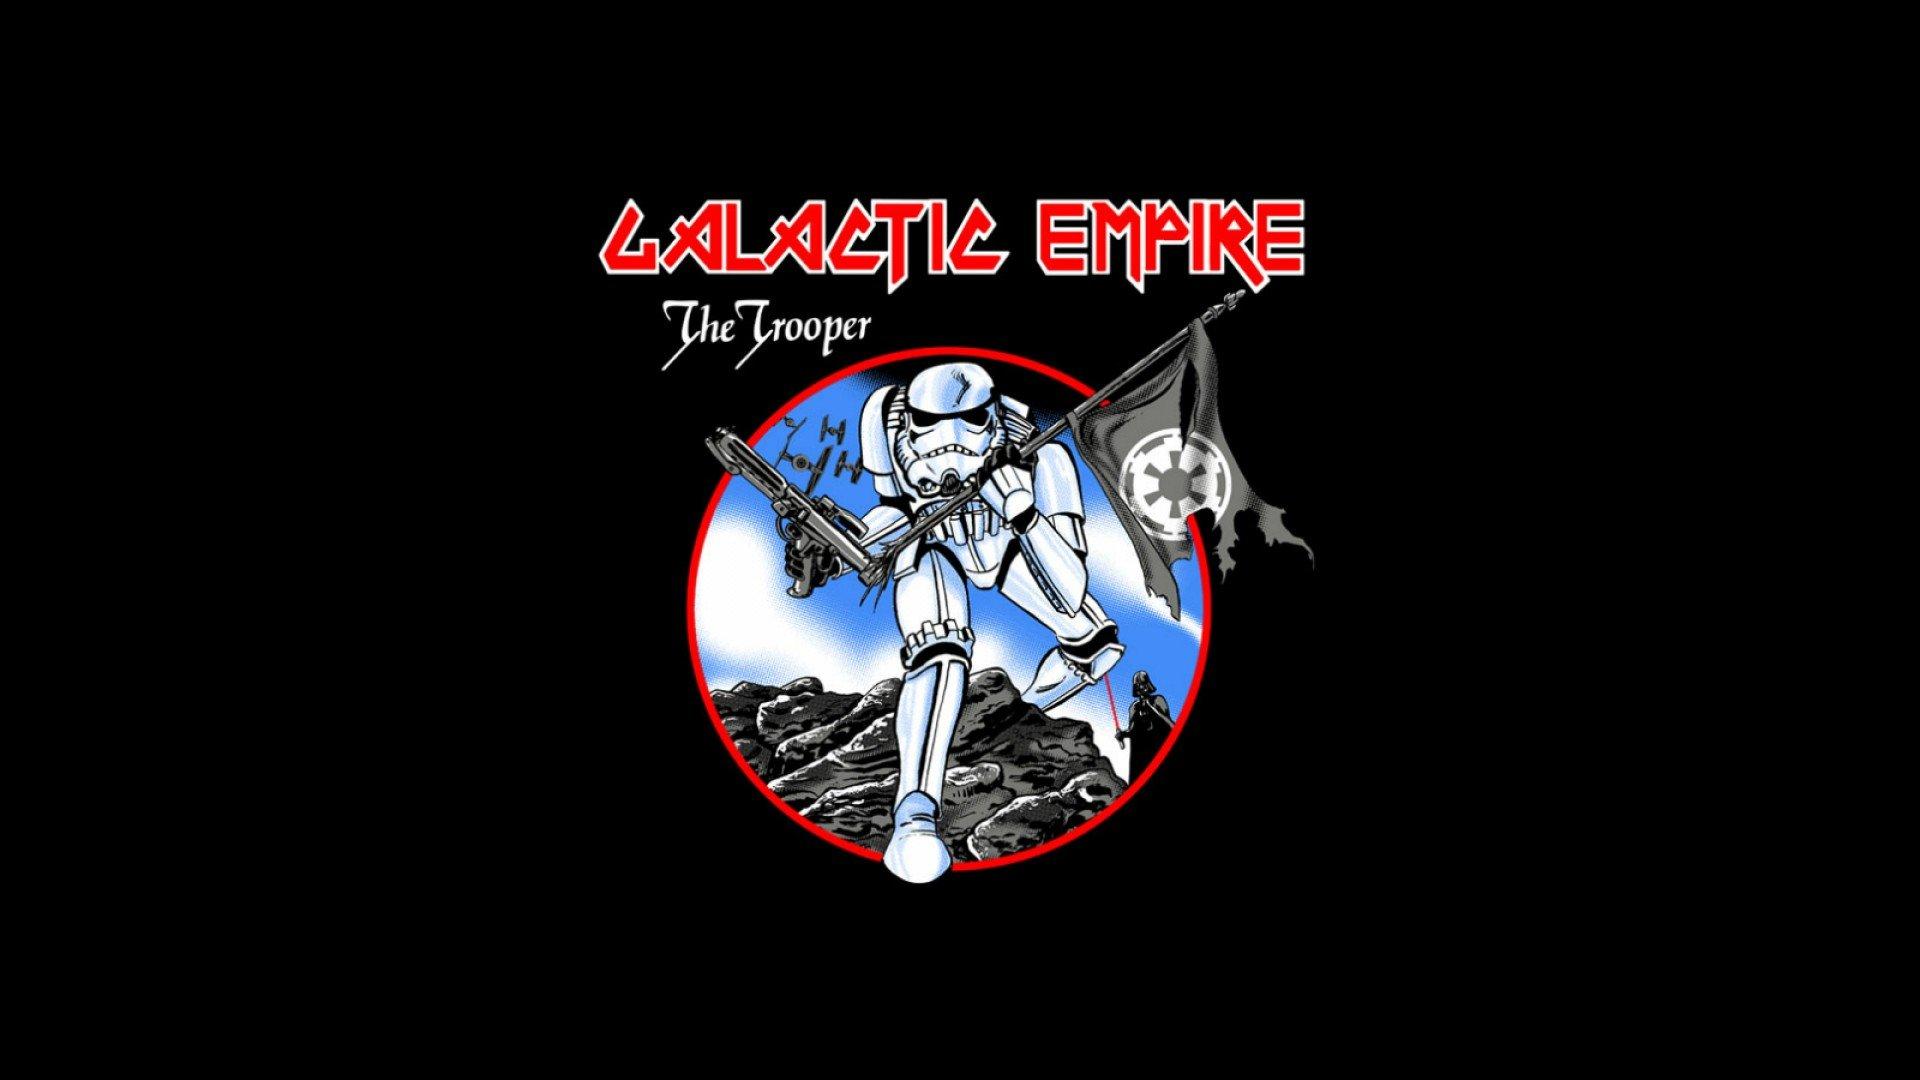 Funny Star Wars Wallpaper Hd Free Download For Desktop Iron Maiden The Trooper Parody 1920x1080 Wallpaper Teahub Io